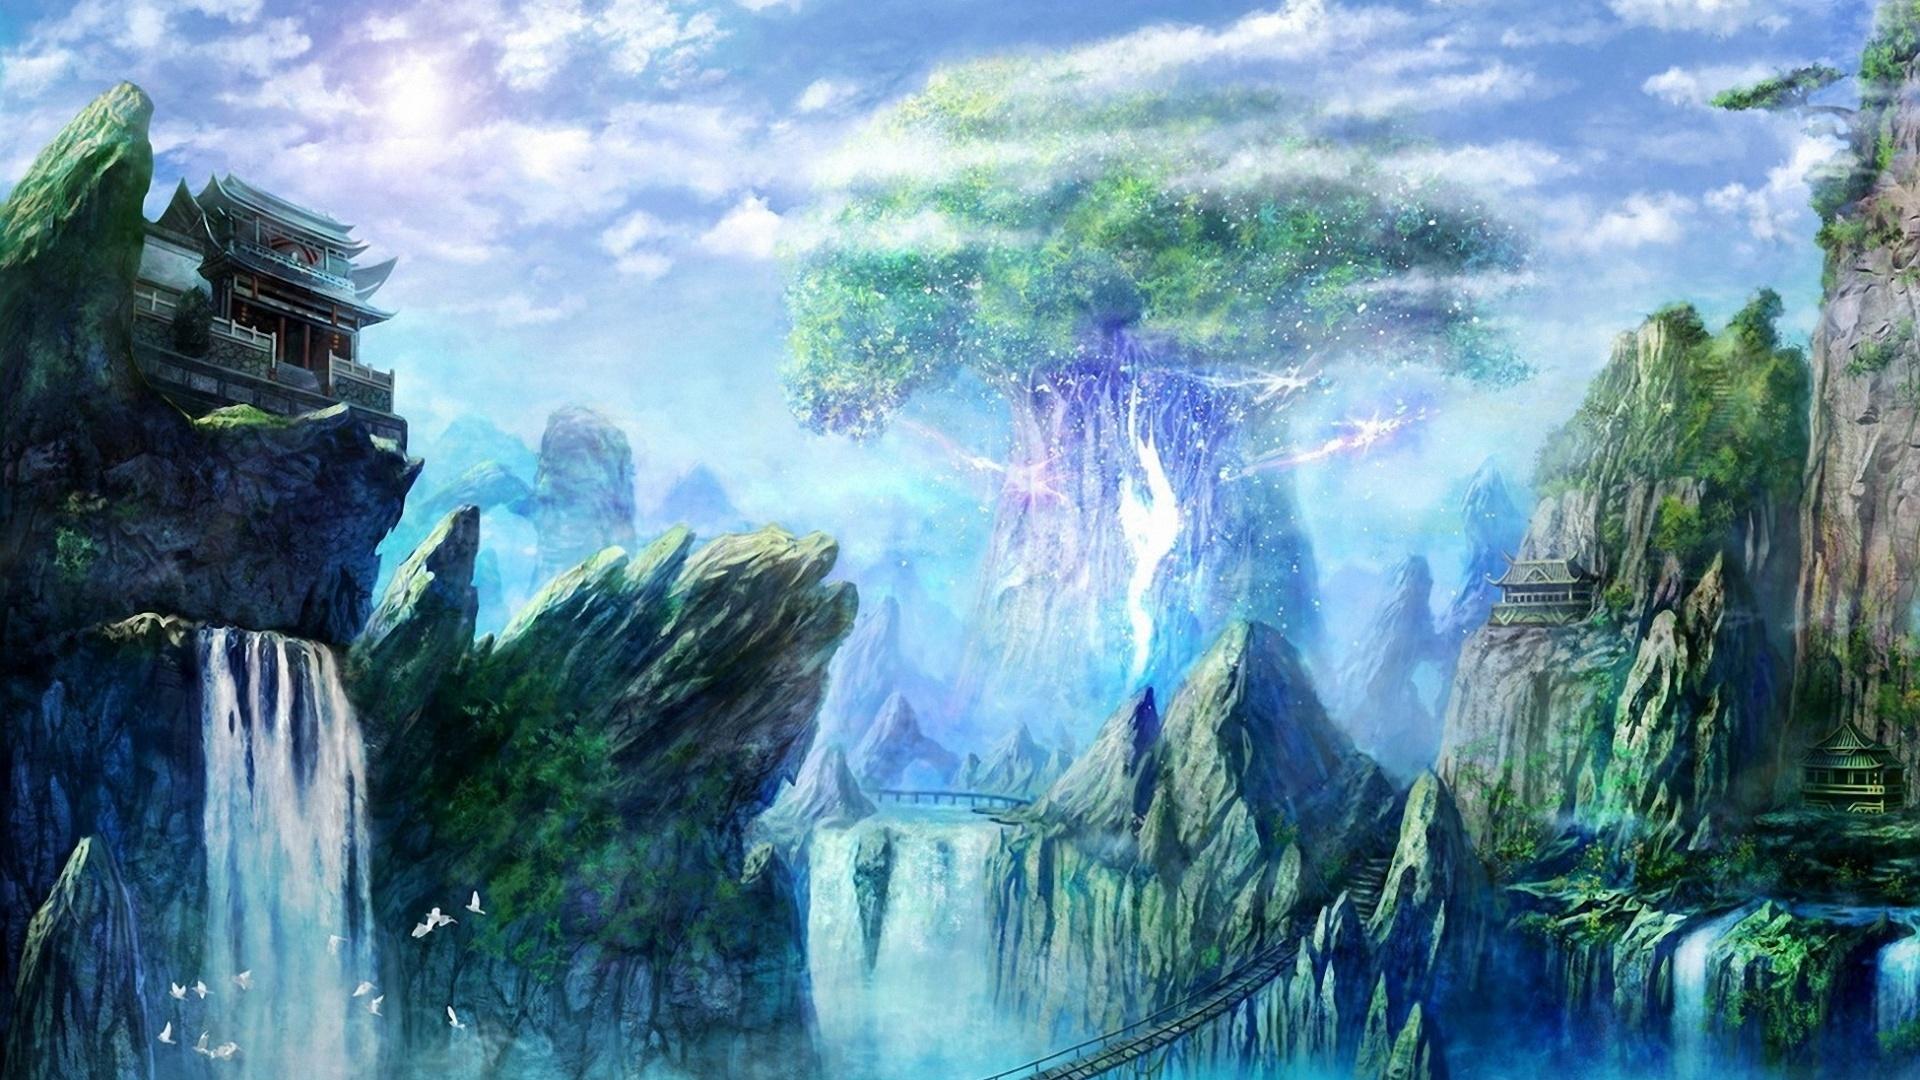 Paradise Art Wallpaper theme